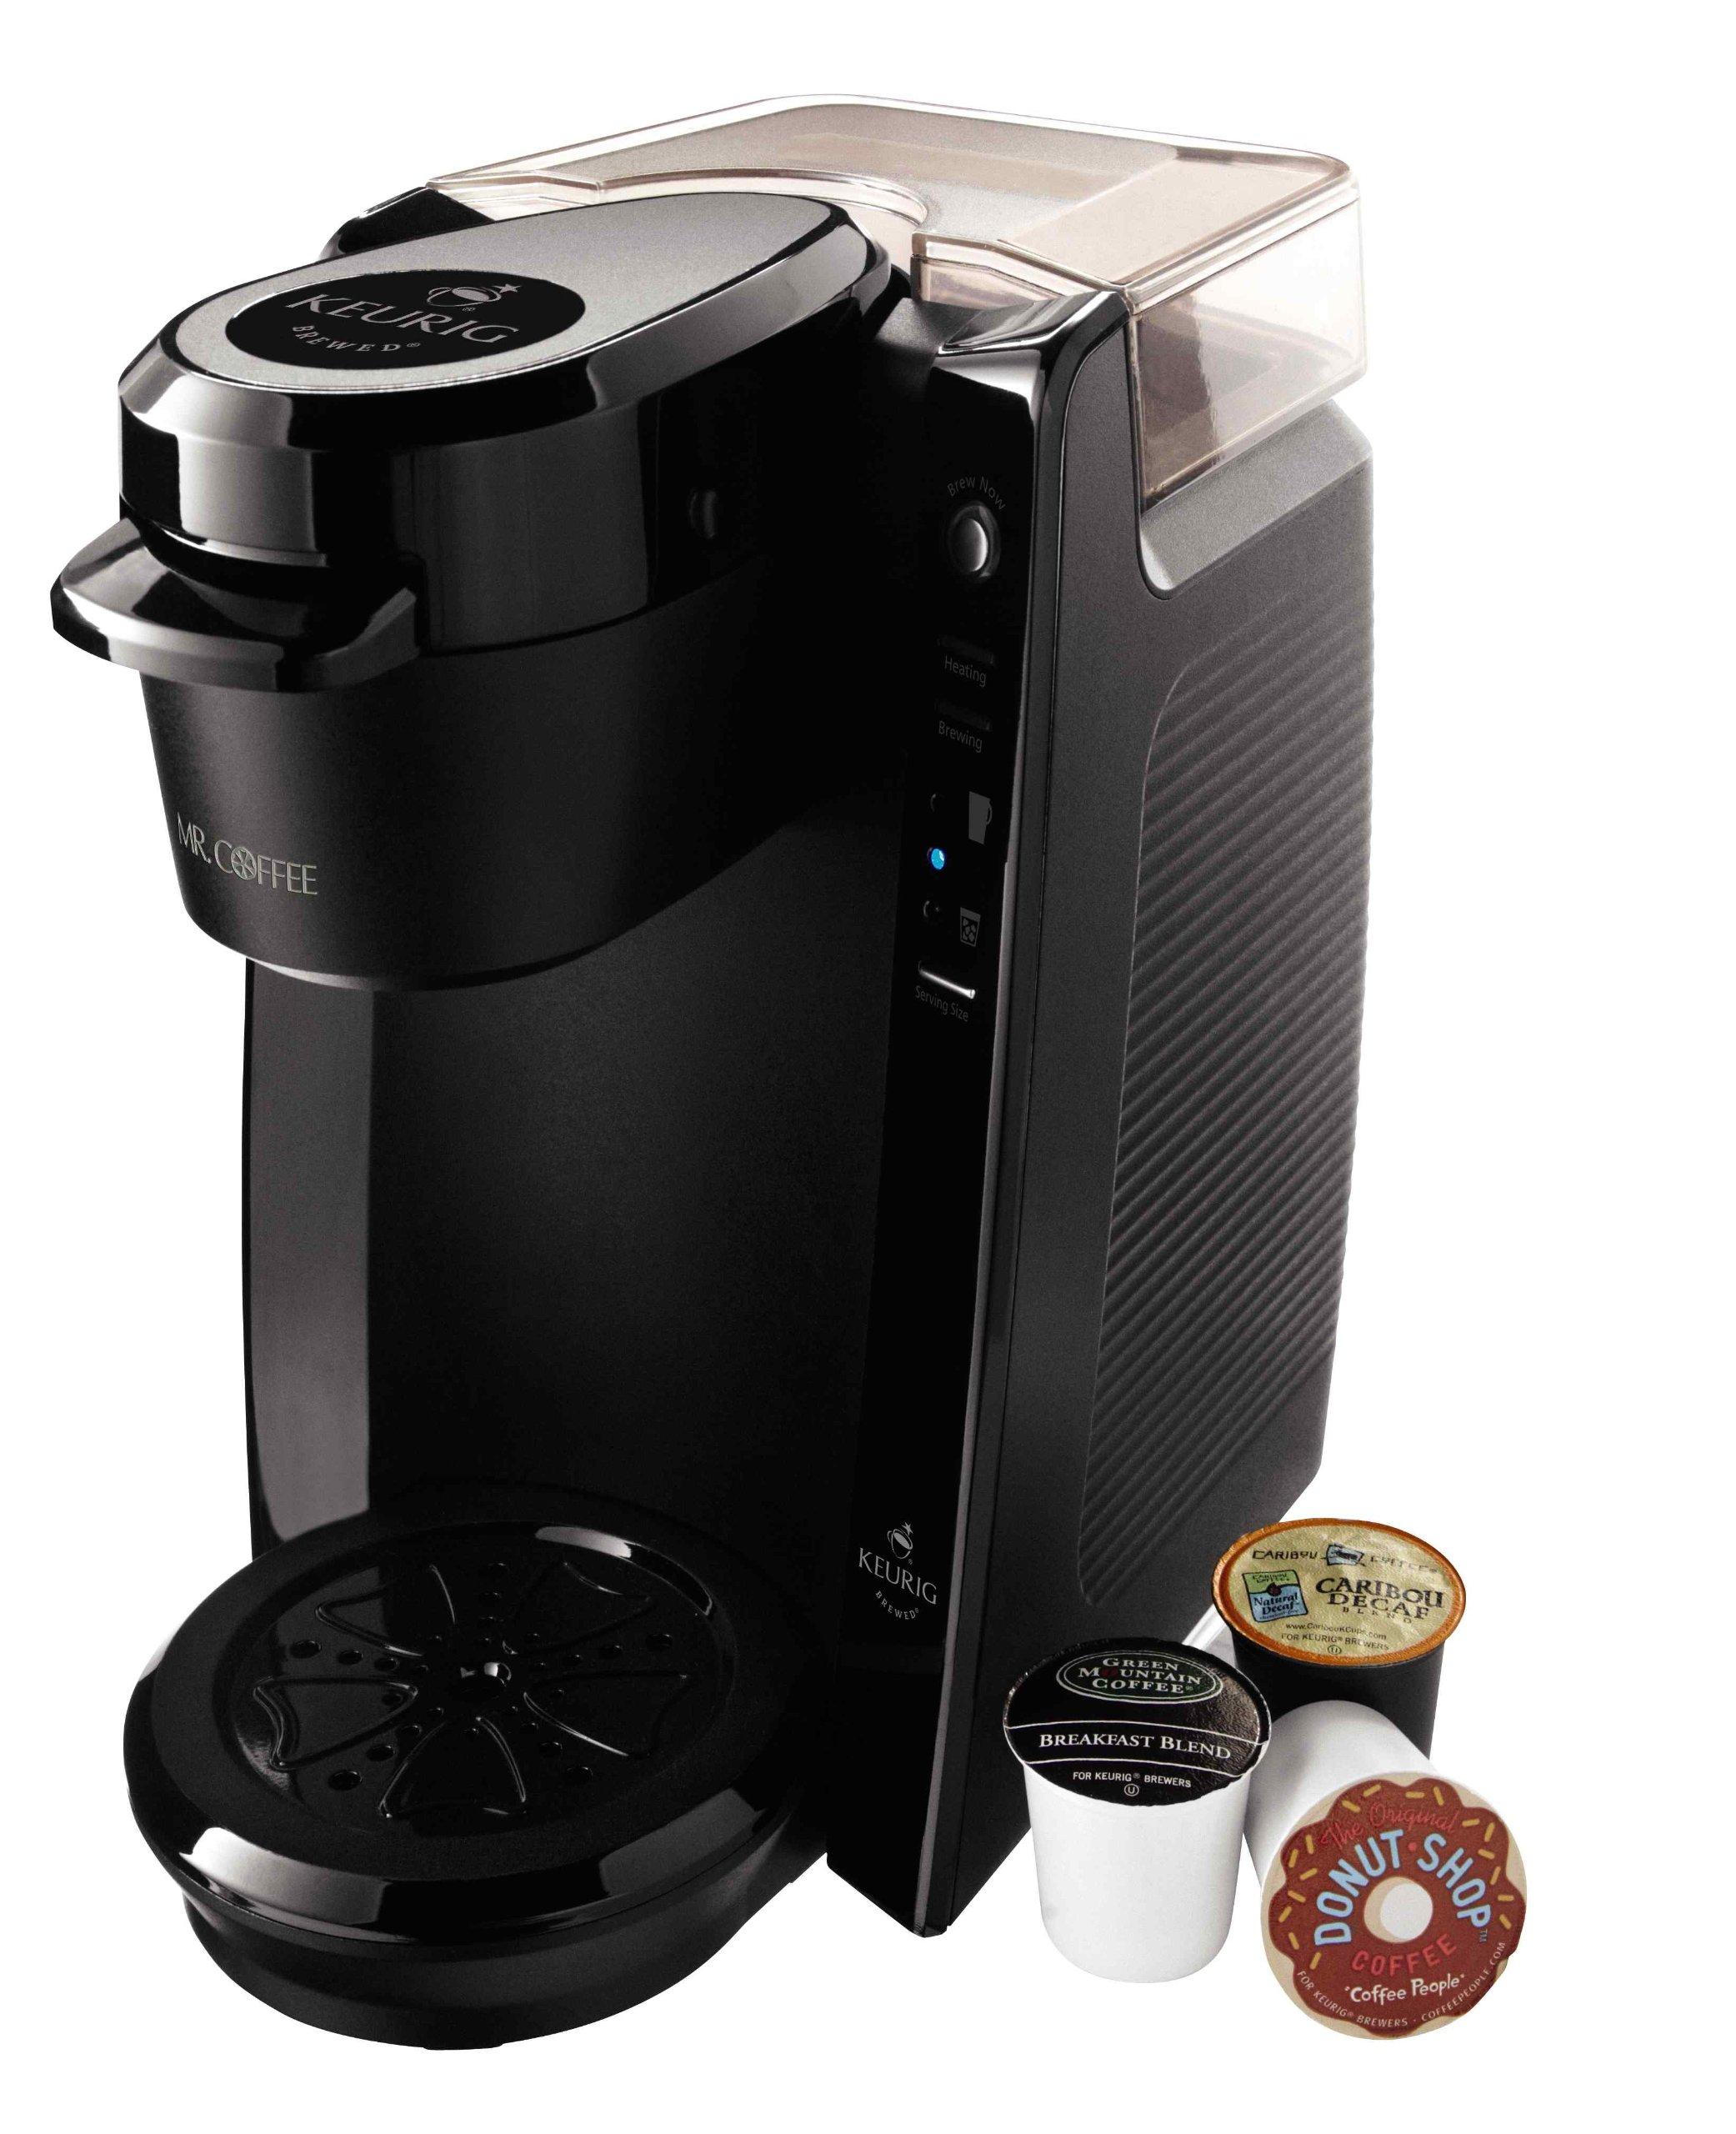 Mr. Coffee Single Serve 24 oz. Coffee Brewer, Black by Mr. Coffee